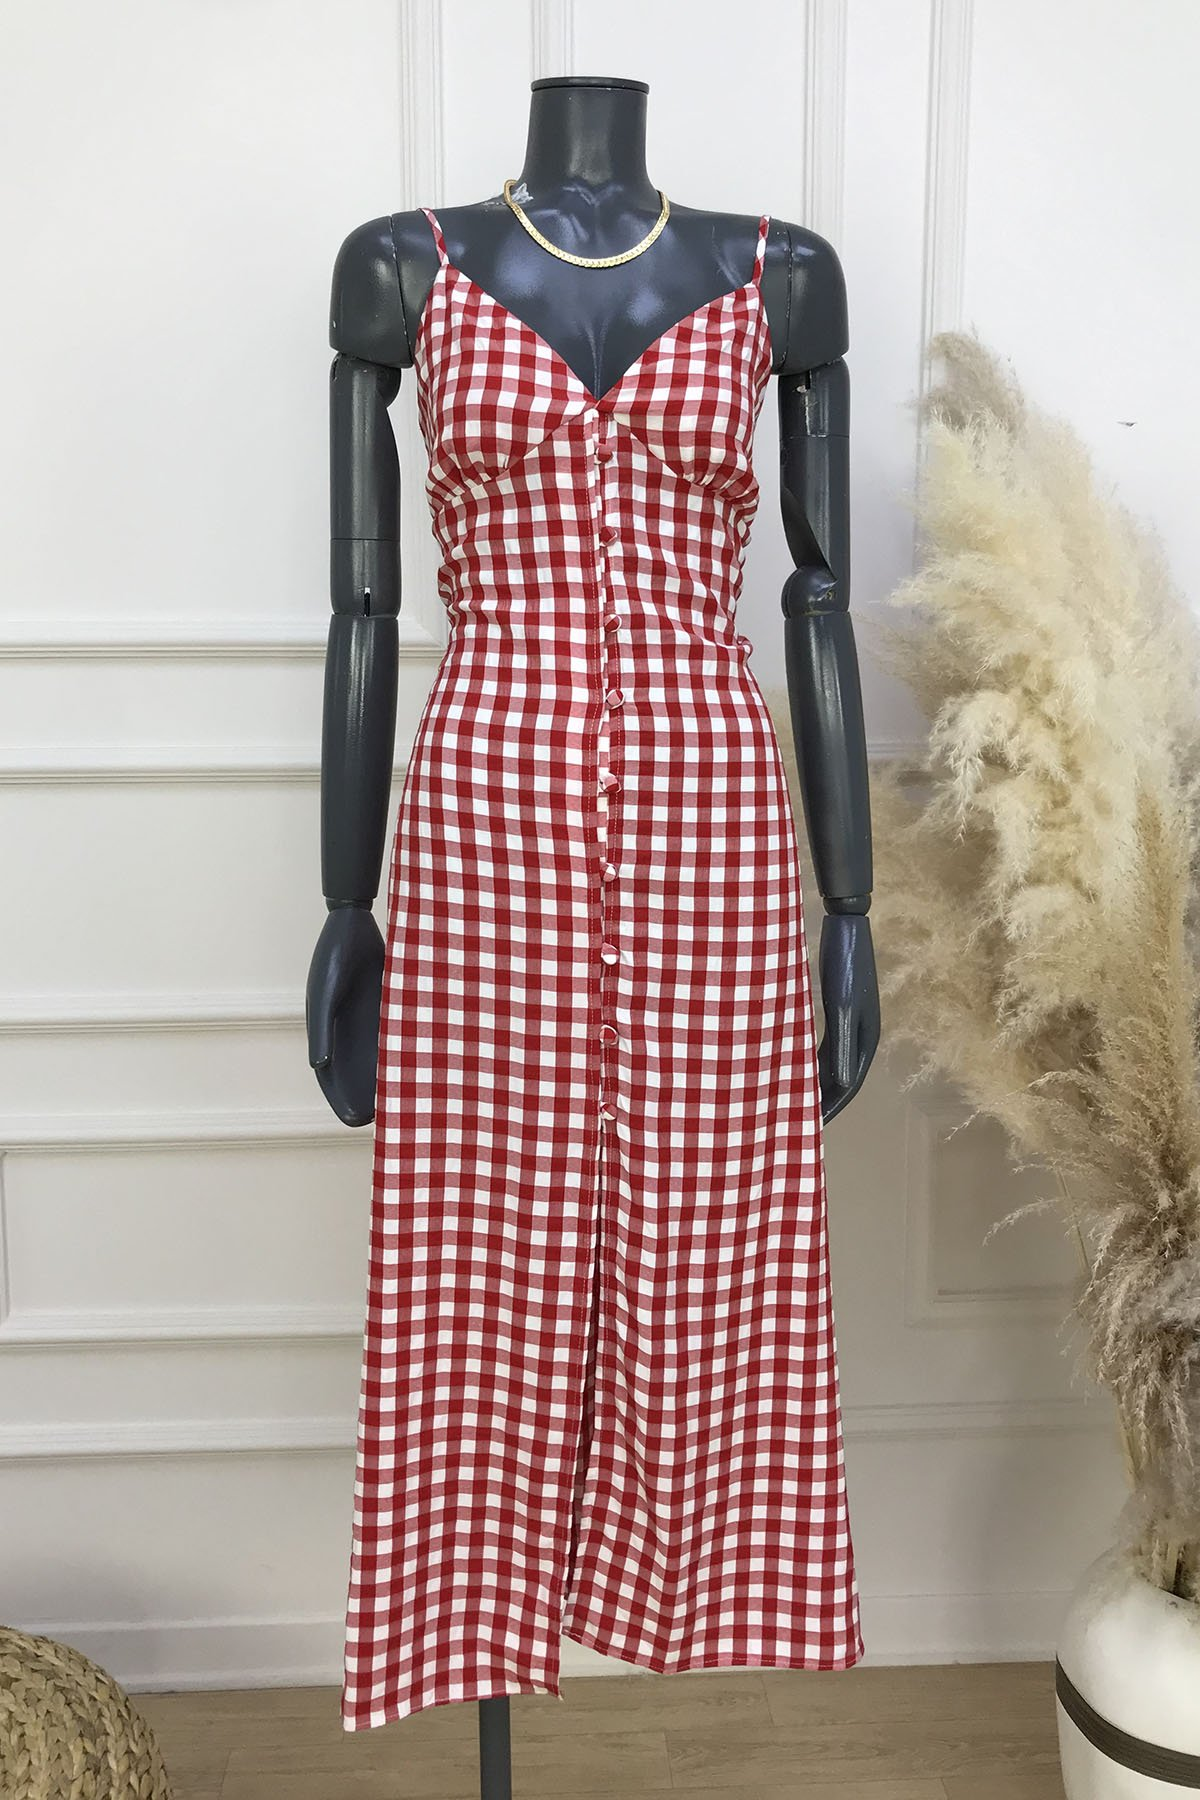 https://resim.ademexclusive.com/af001886/krm/170-31485-sirt-dekolteli-onu-dugmeli-elbise-0104bffeb14c.jpg